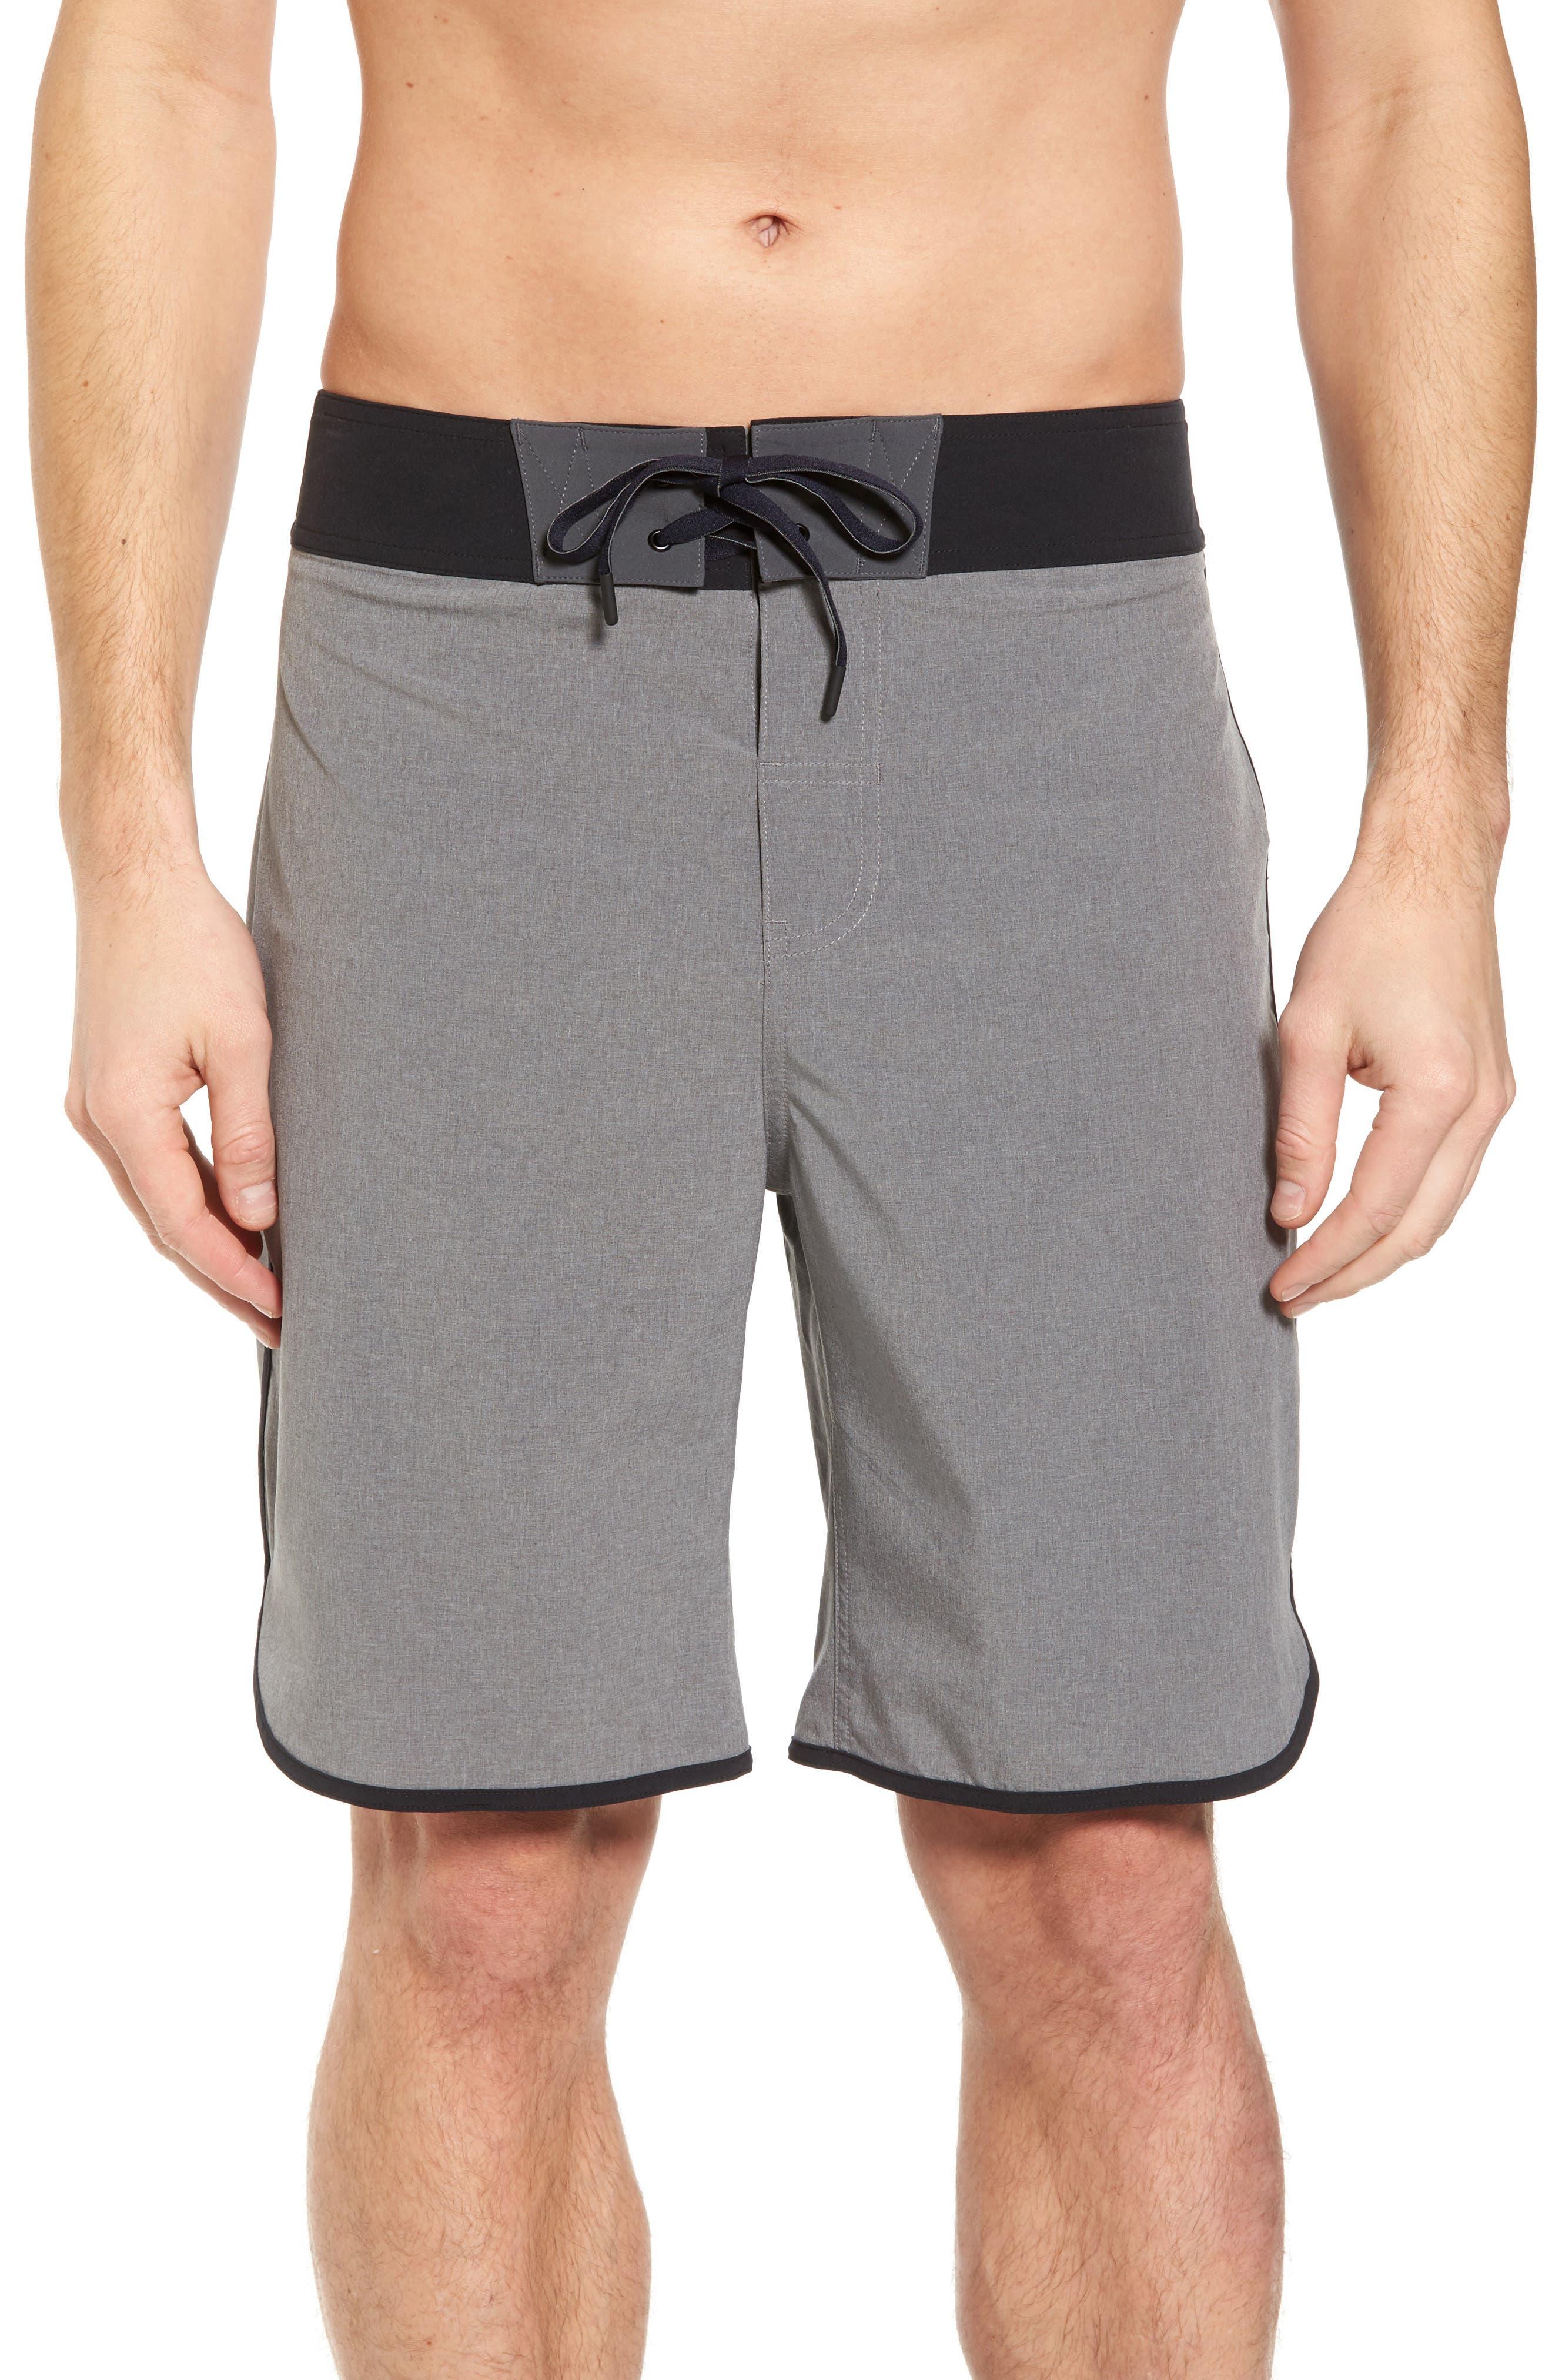 Alternate Image 1 Selected - Beachbody Flex Hybrid Athletic Shorts